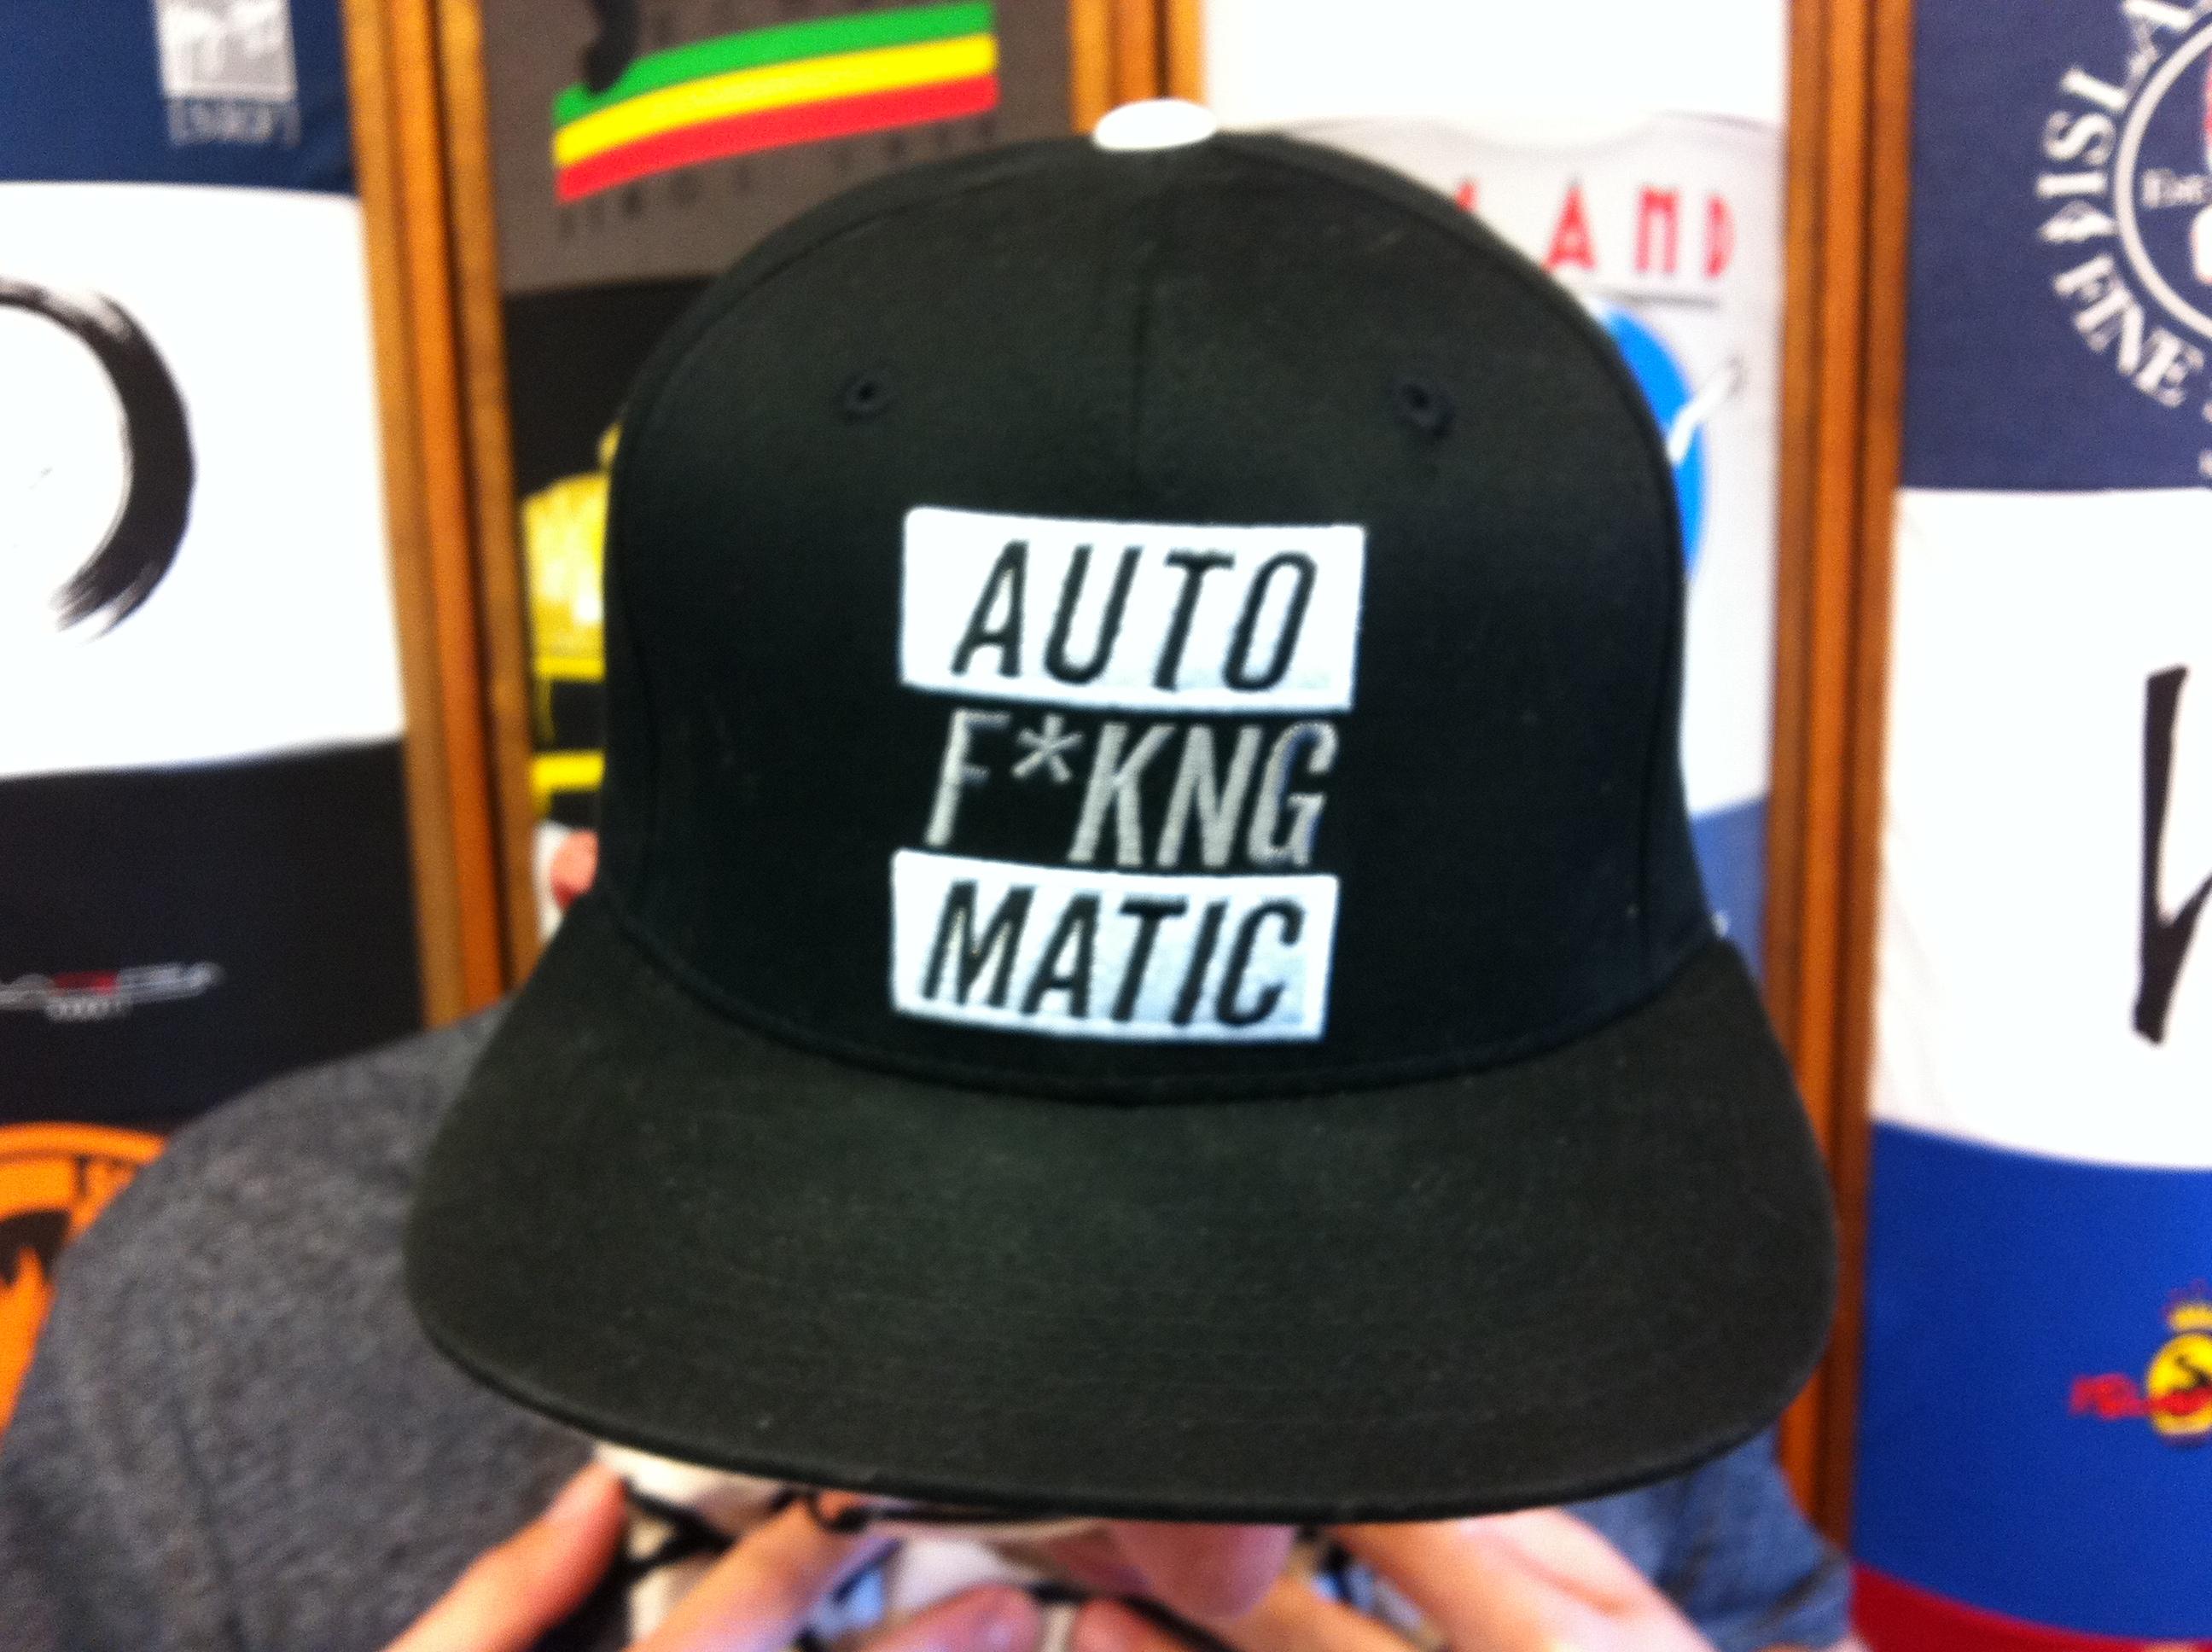 Auto-fucking-mattic, yo